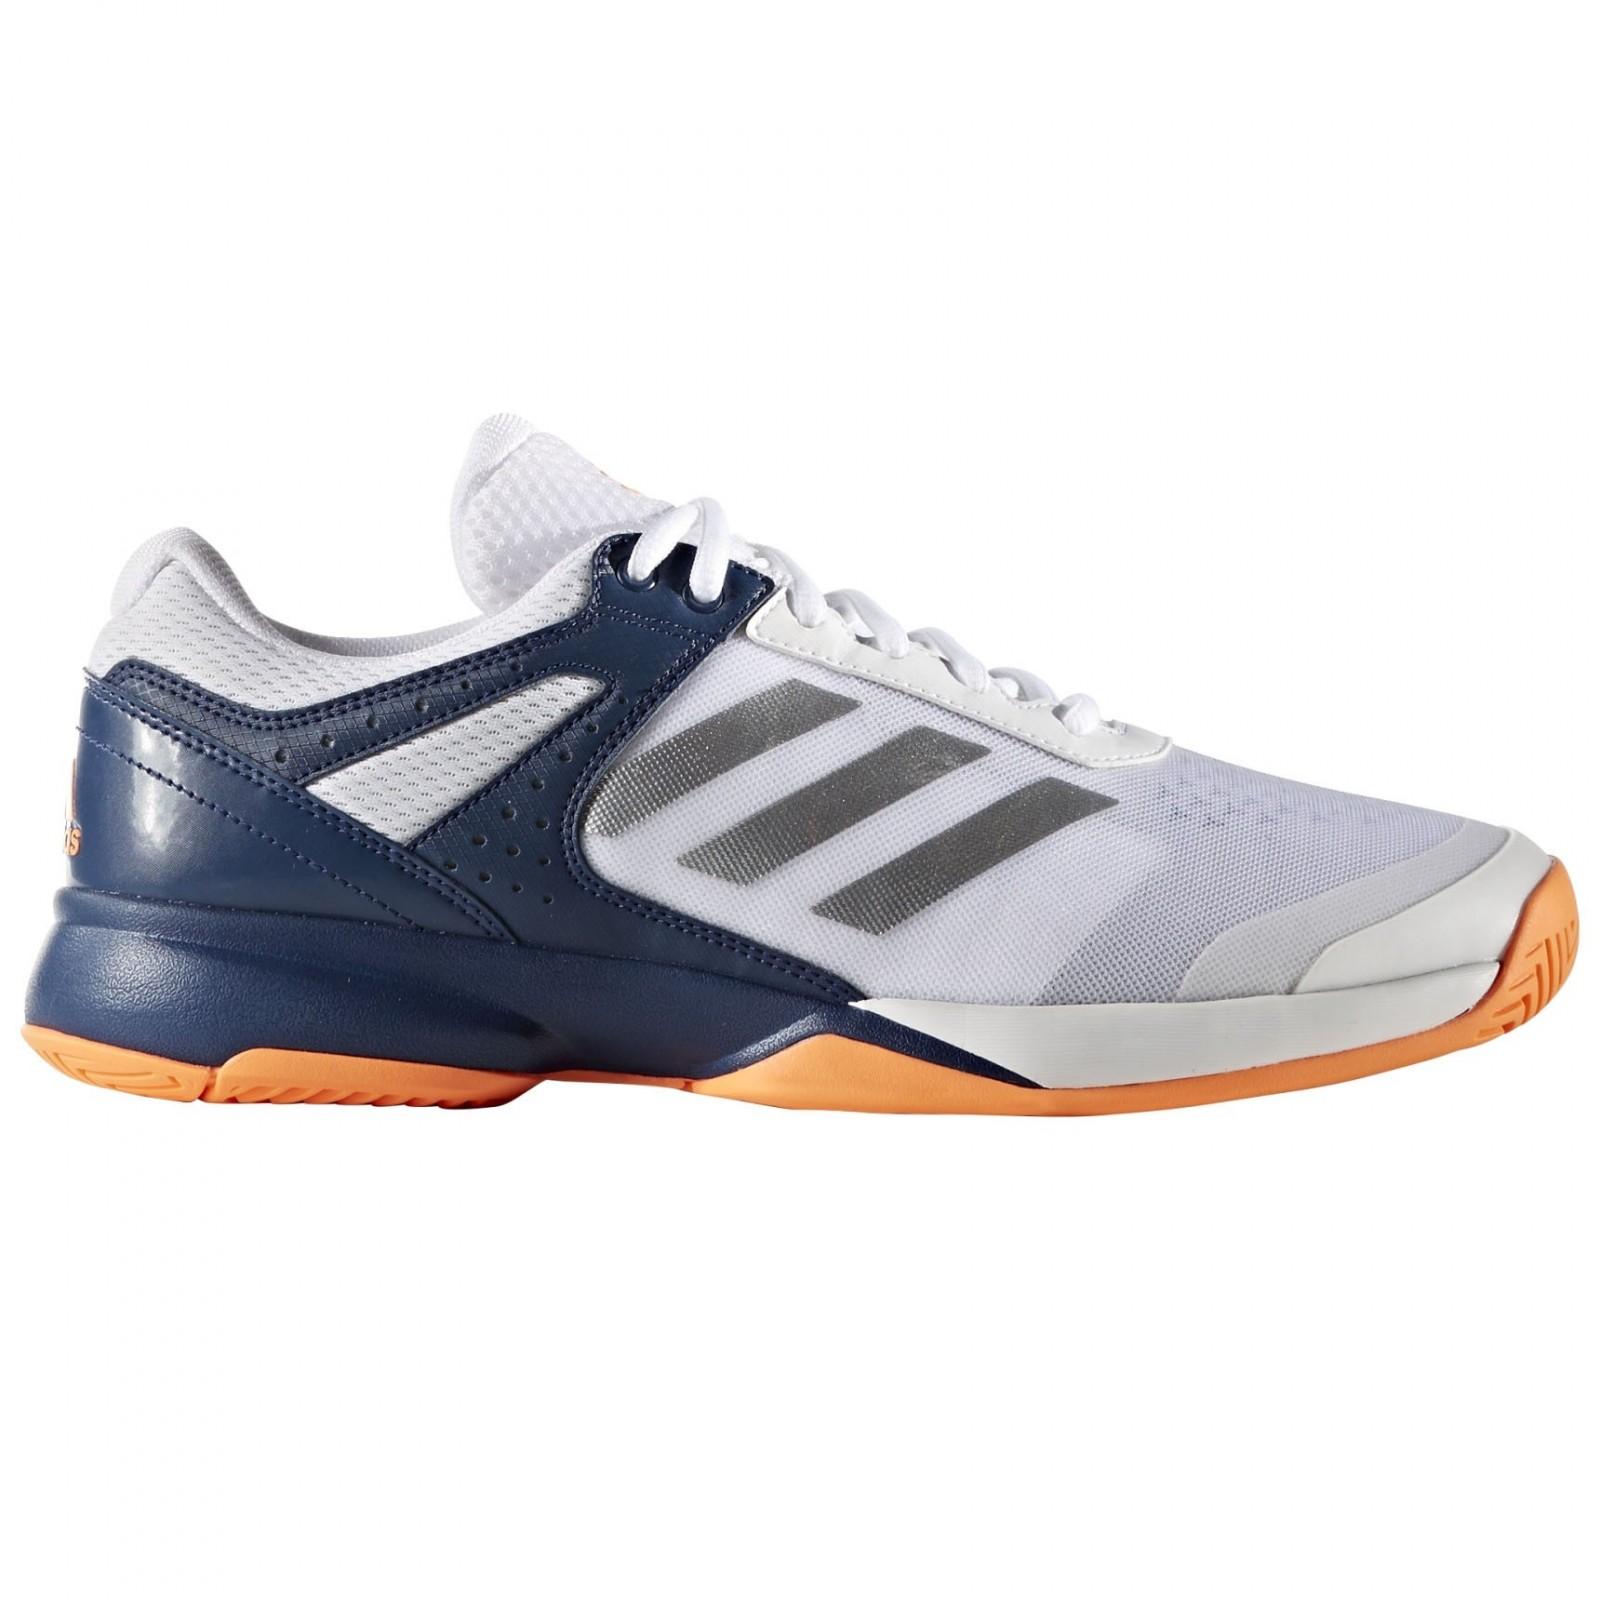 3607163396a Pánské tenisové boty adidas adizero court